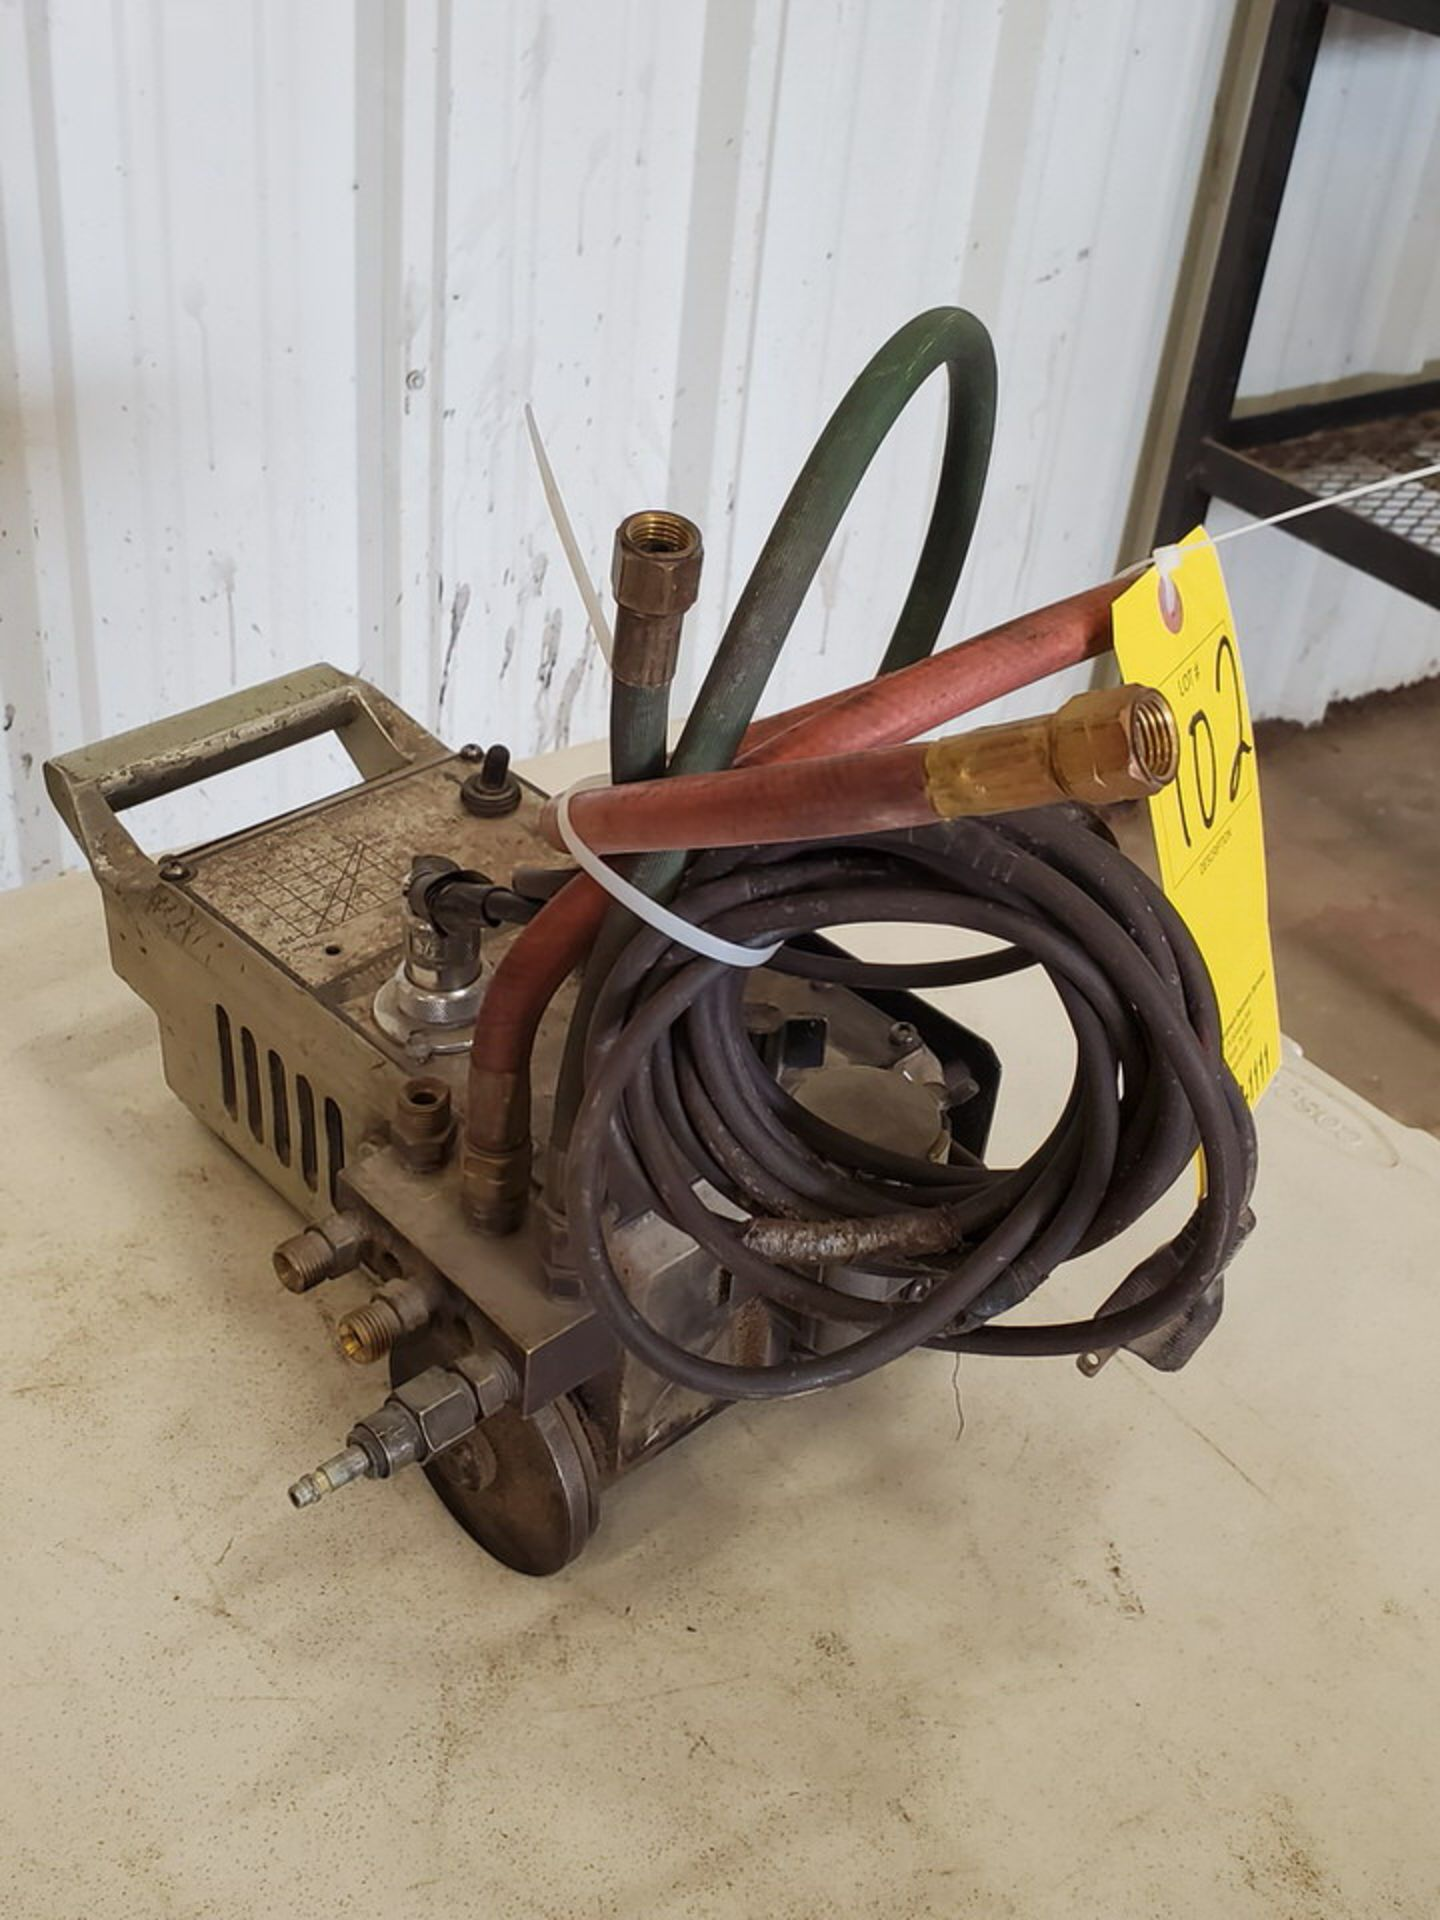 Profax Portable Track Cutting Machine 115V - Image 3 of 5